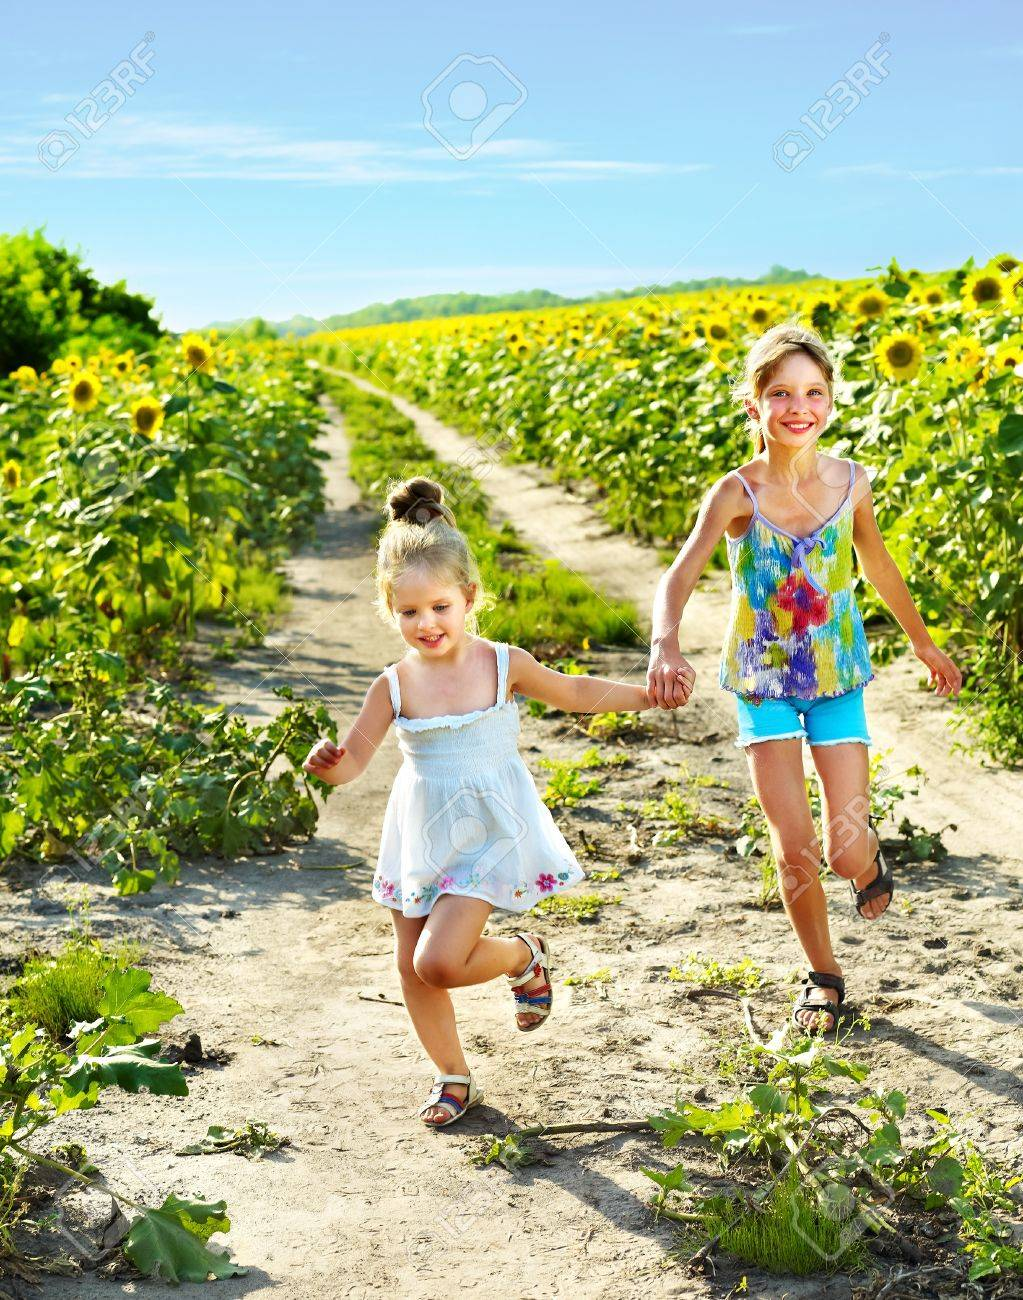 Group children running across sunflower field outdoor. Stock Photo - 10701518